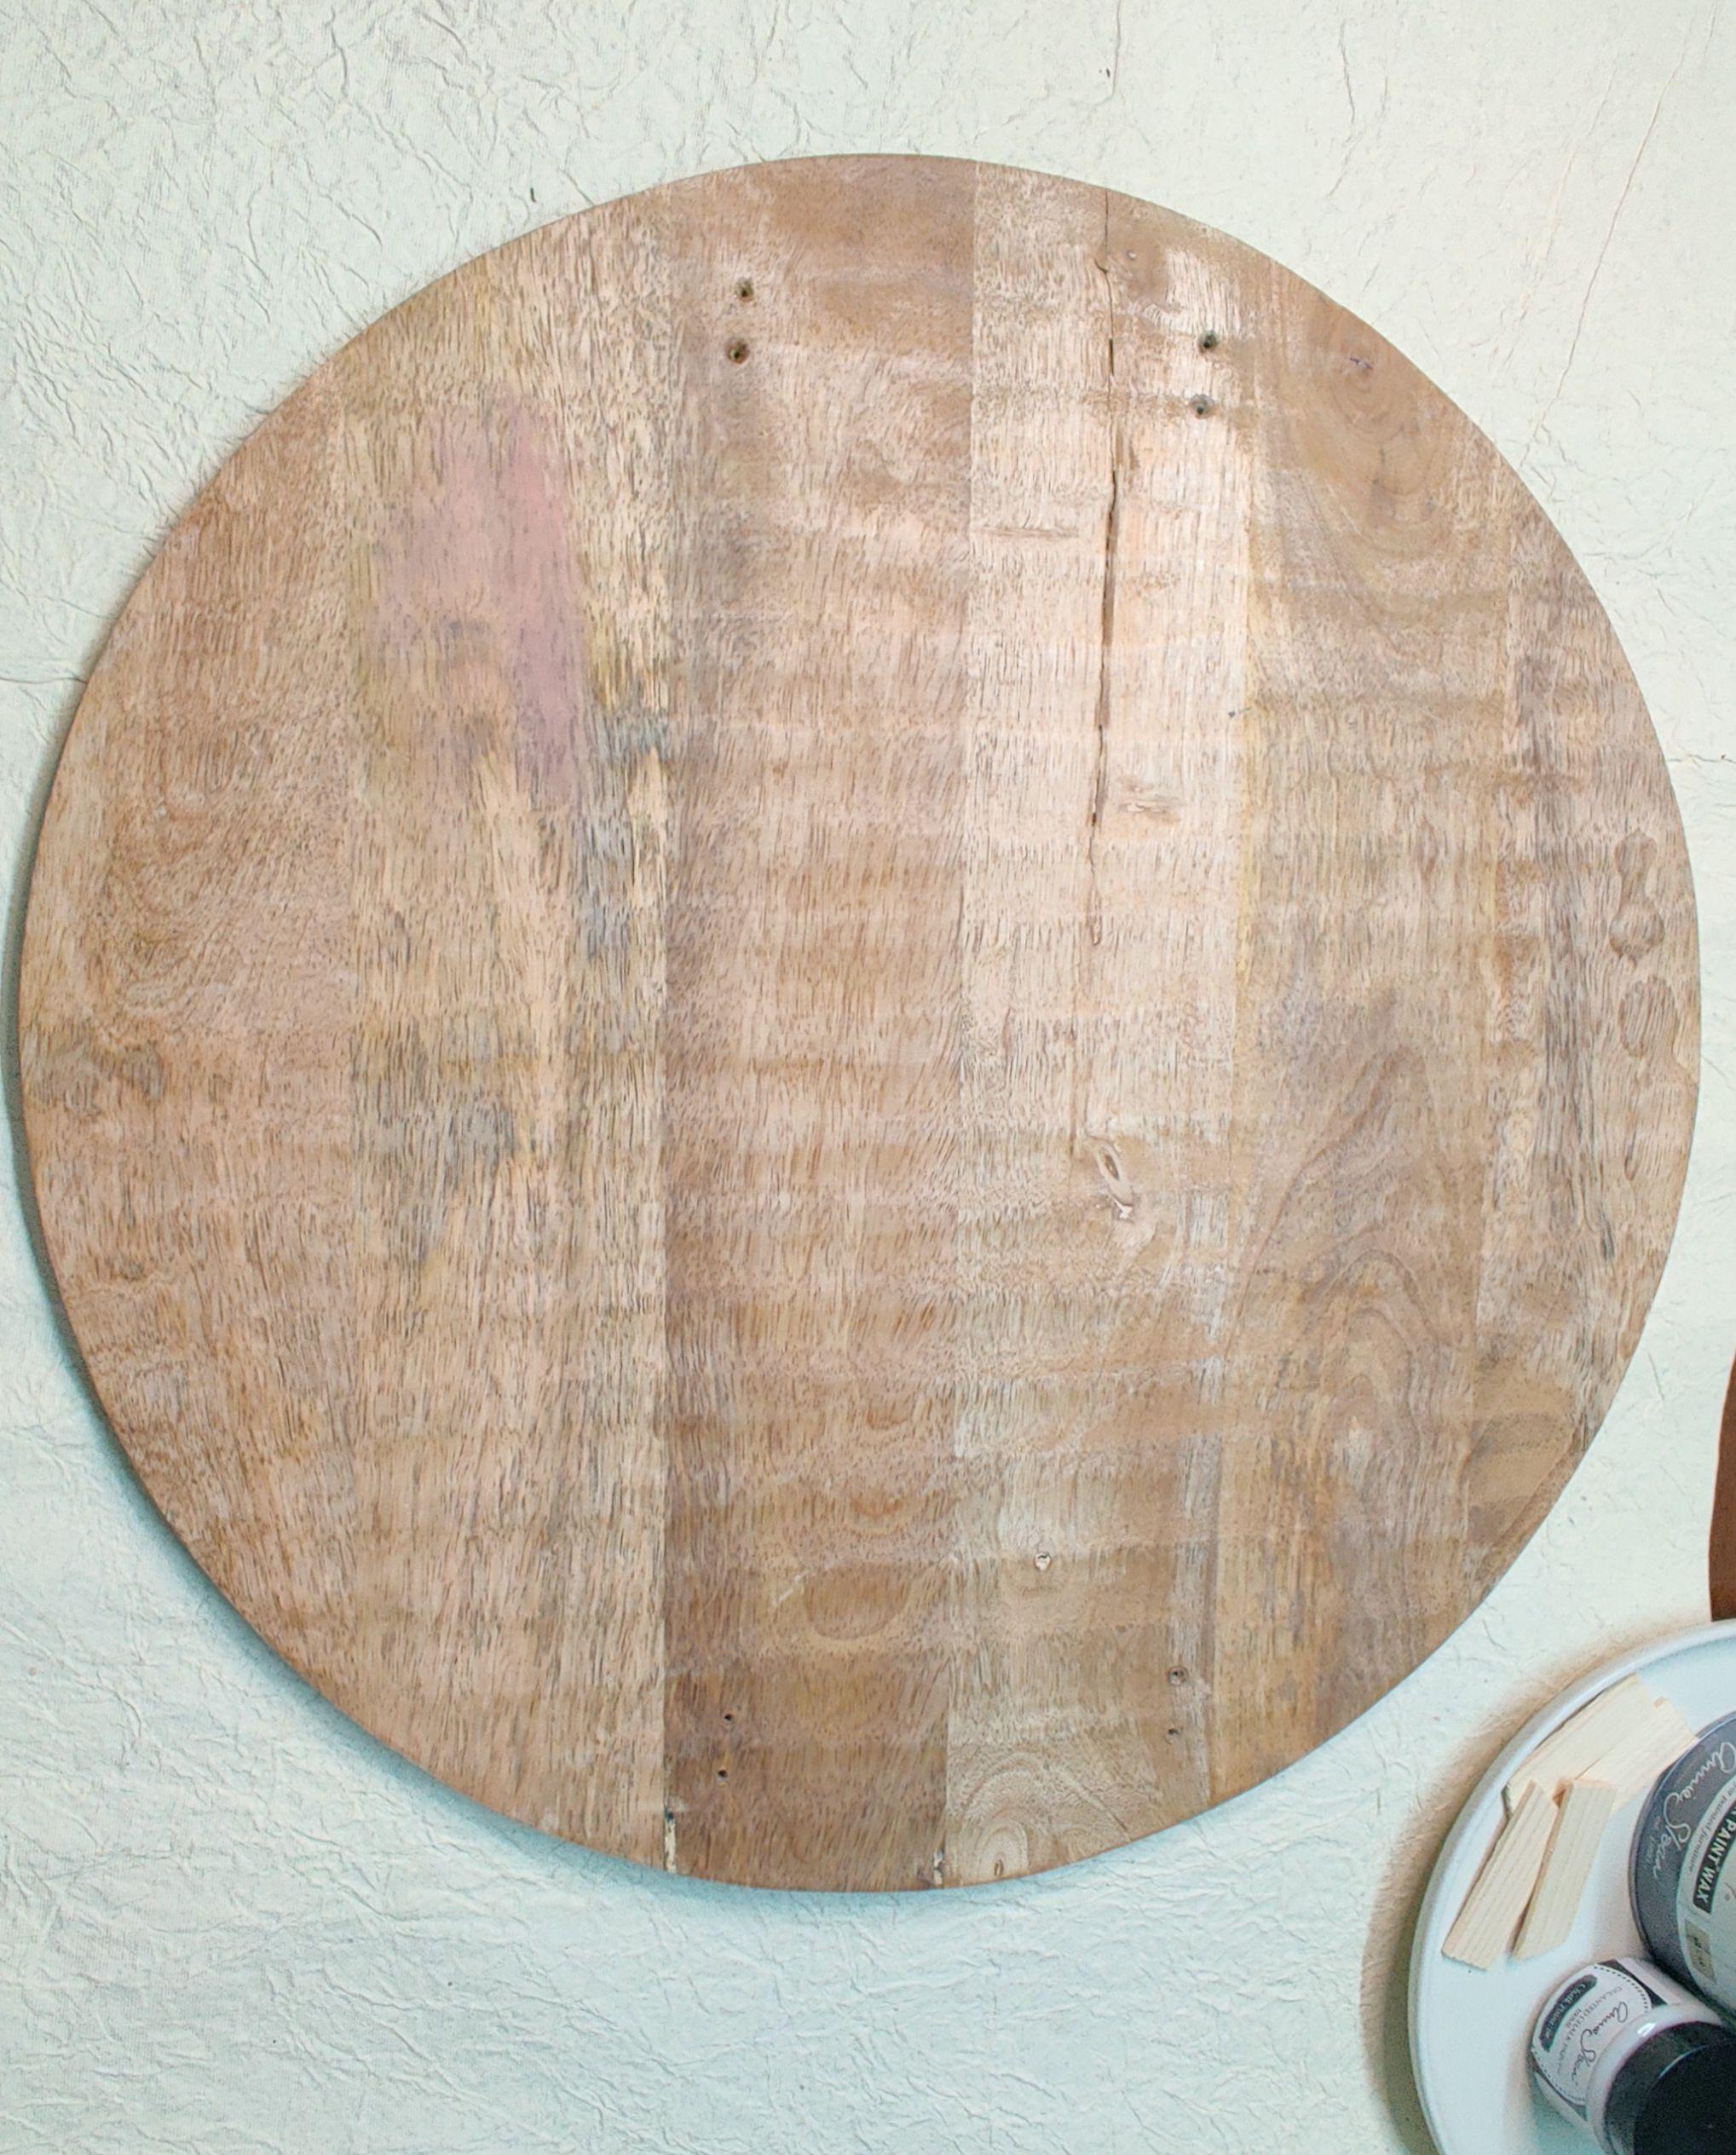 diy room decor-wooden blank